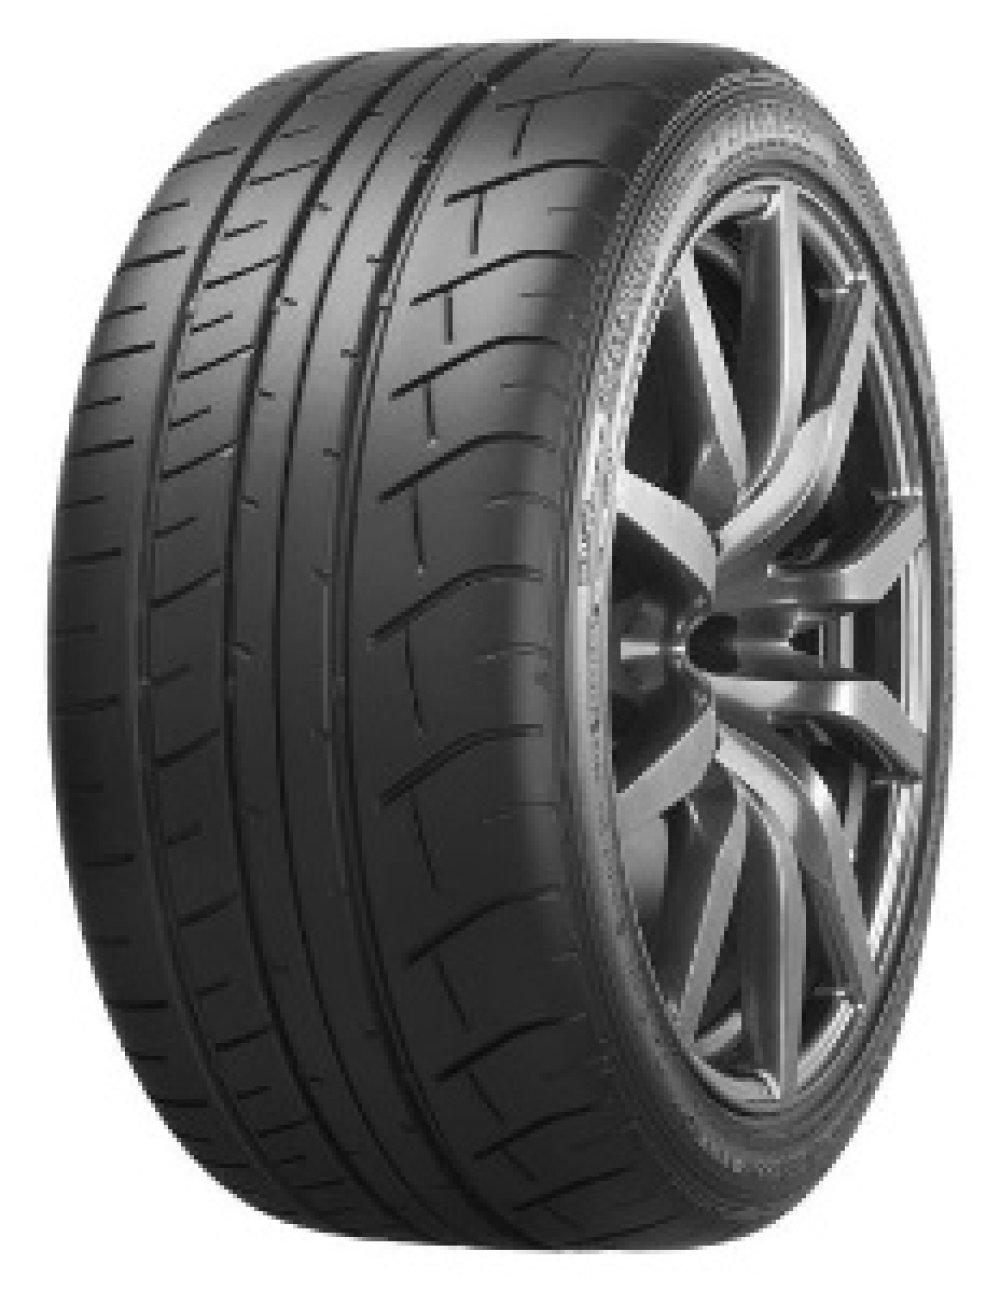 Dunlop SP Sport Maxx GT600 DSST ( 285/35 ZR20 (104Y) XL NR1, runflat )